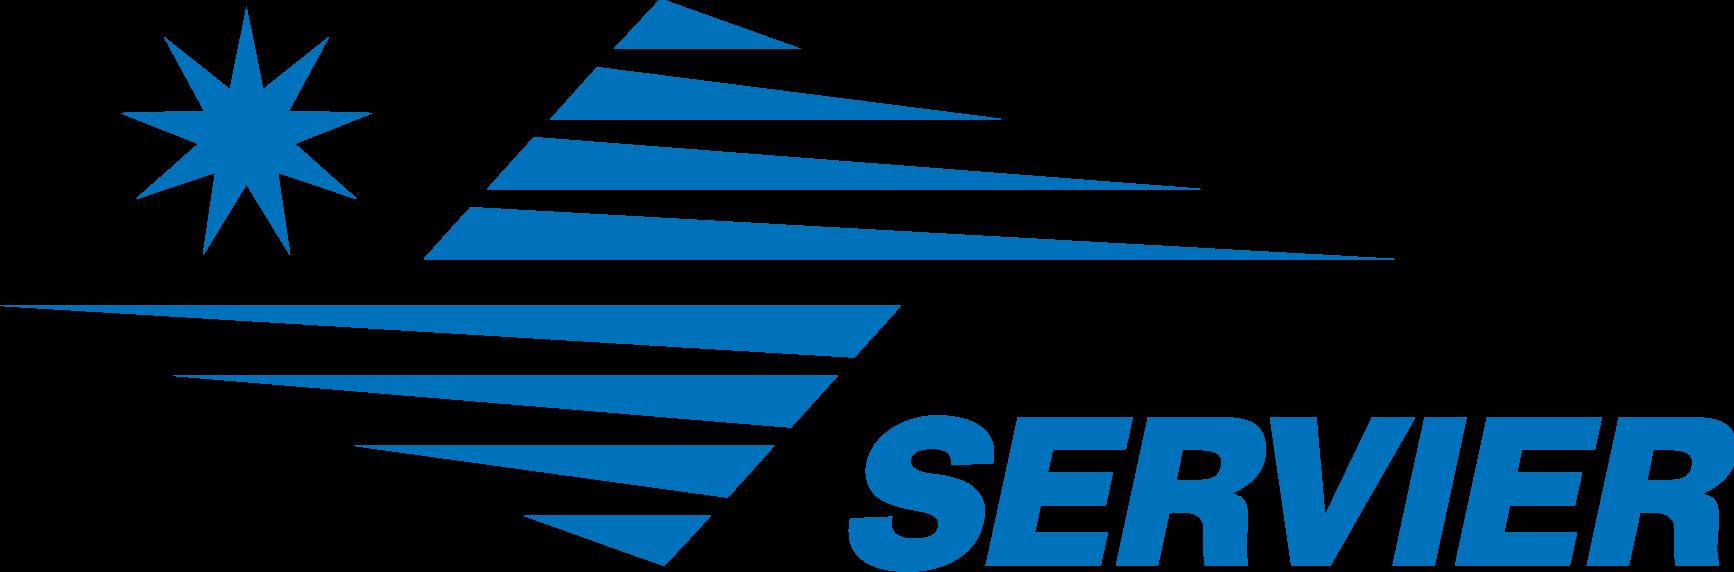 Logo de BIOLOGIE SERVIER